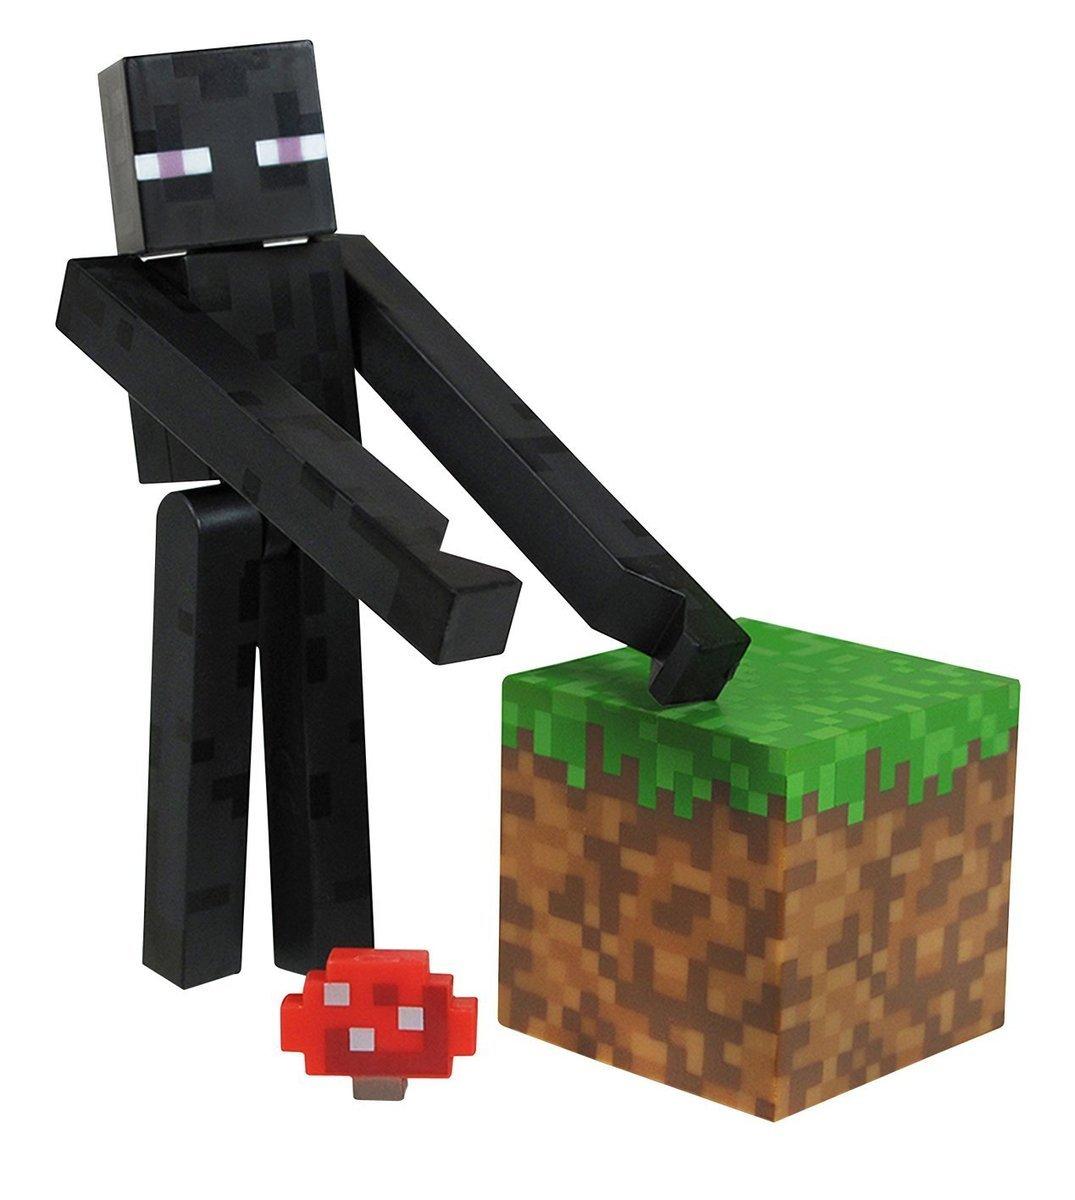 Minecraft Overworld Enderman Action Figure Set